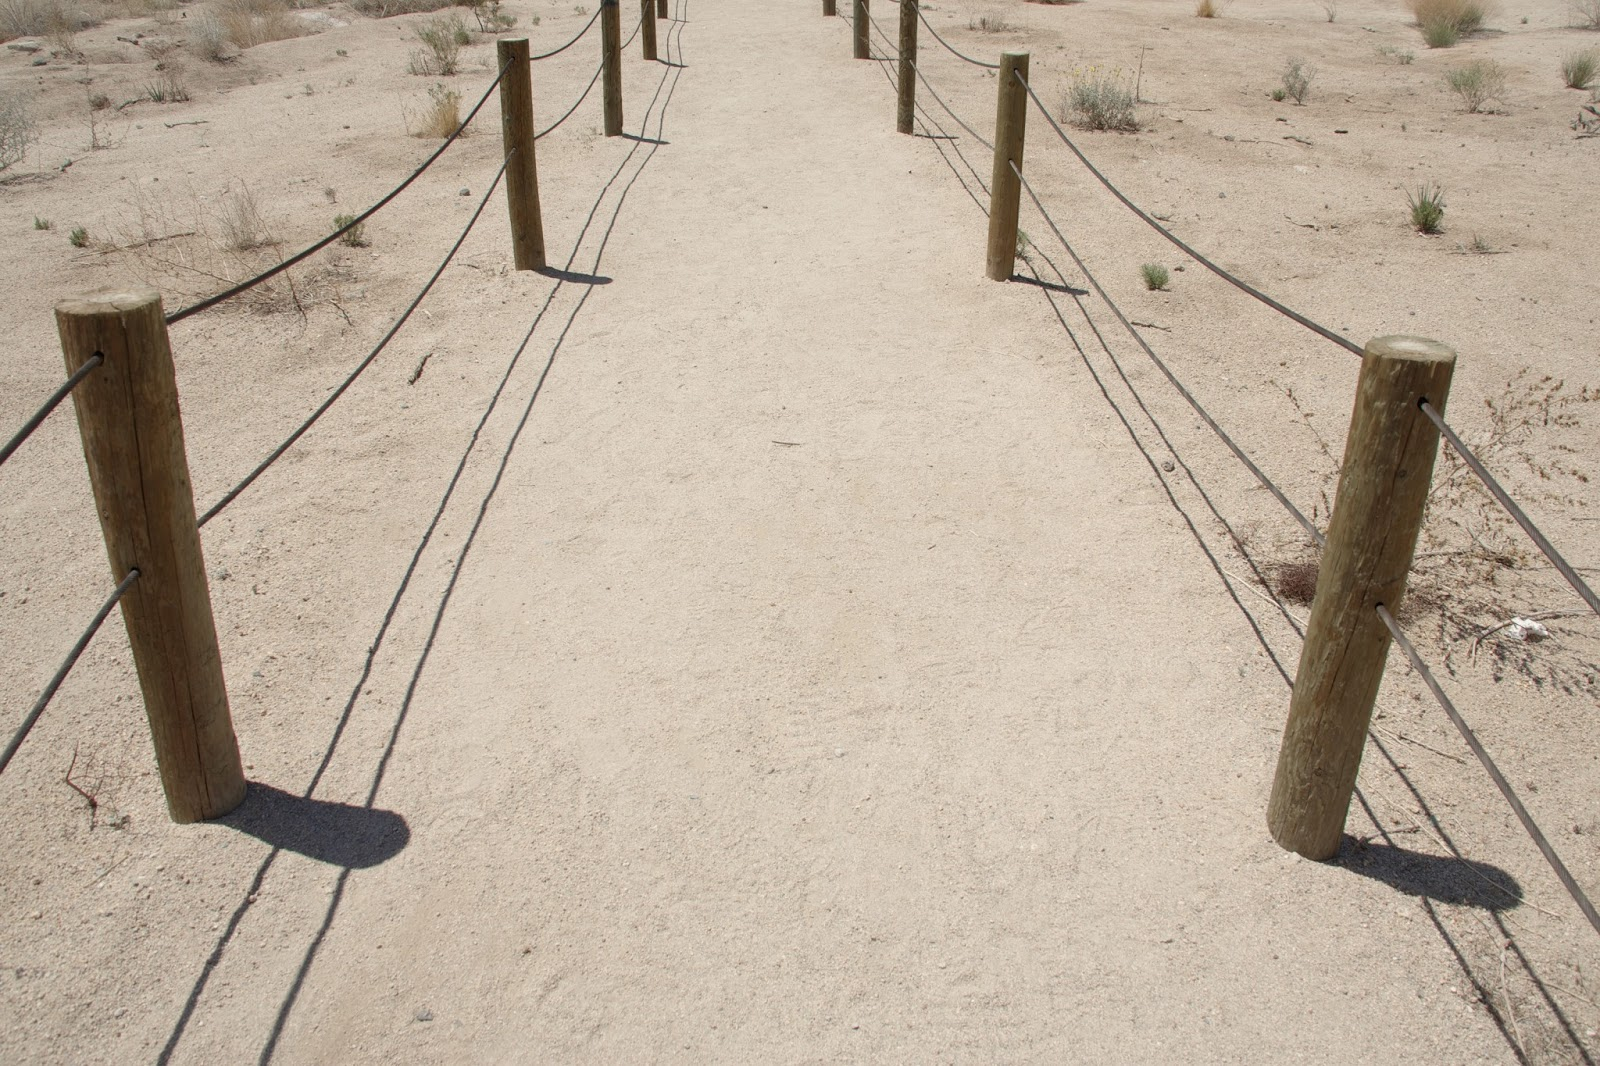 robert frost desert places essay